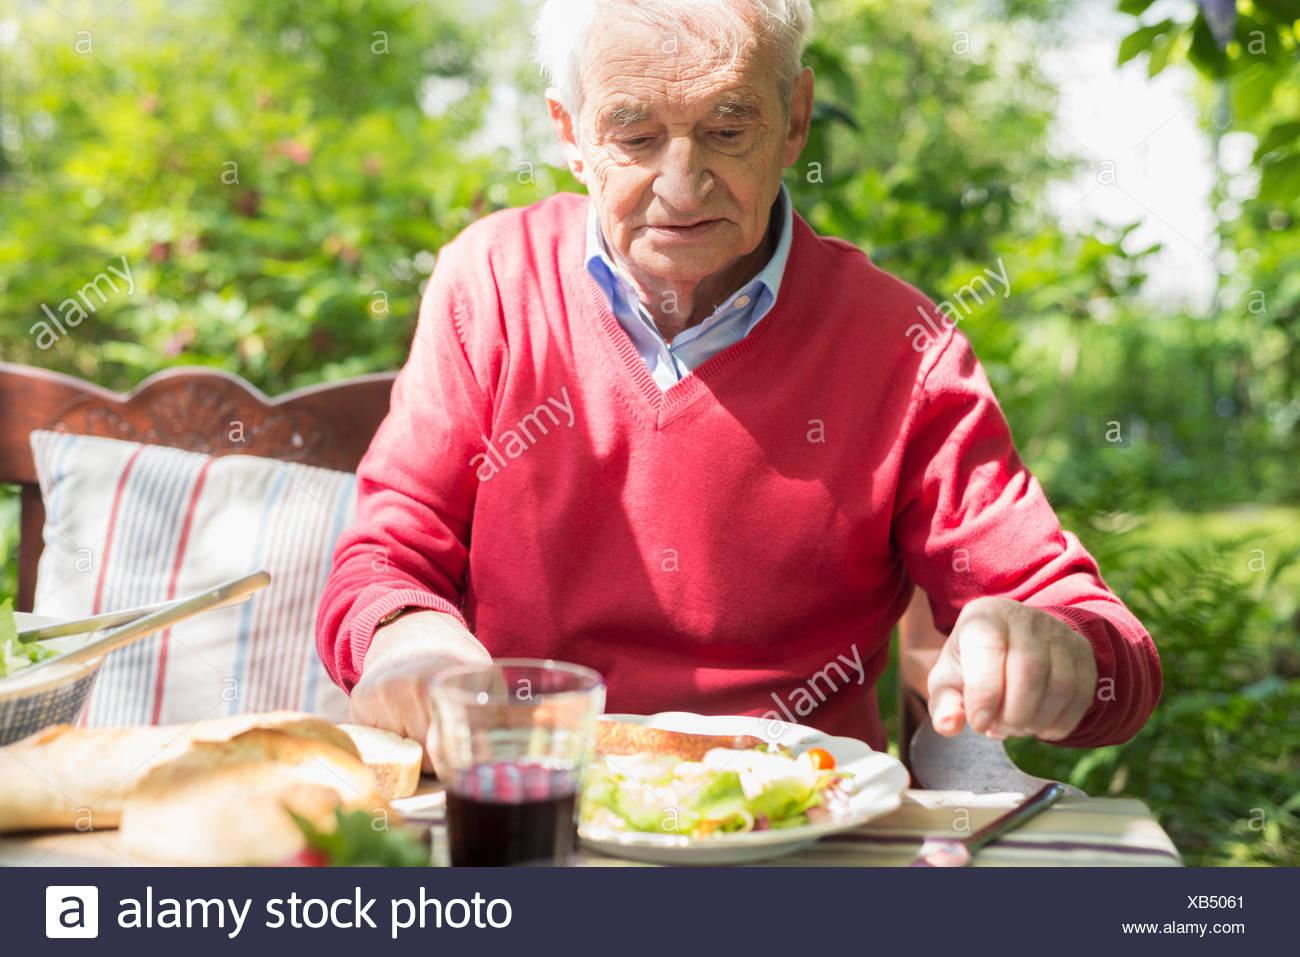 Senior man having lunch outdoors Photo Stock